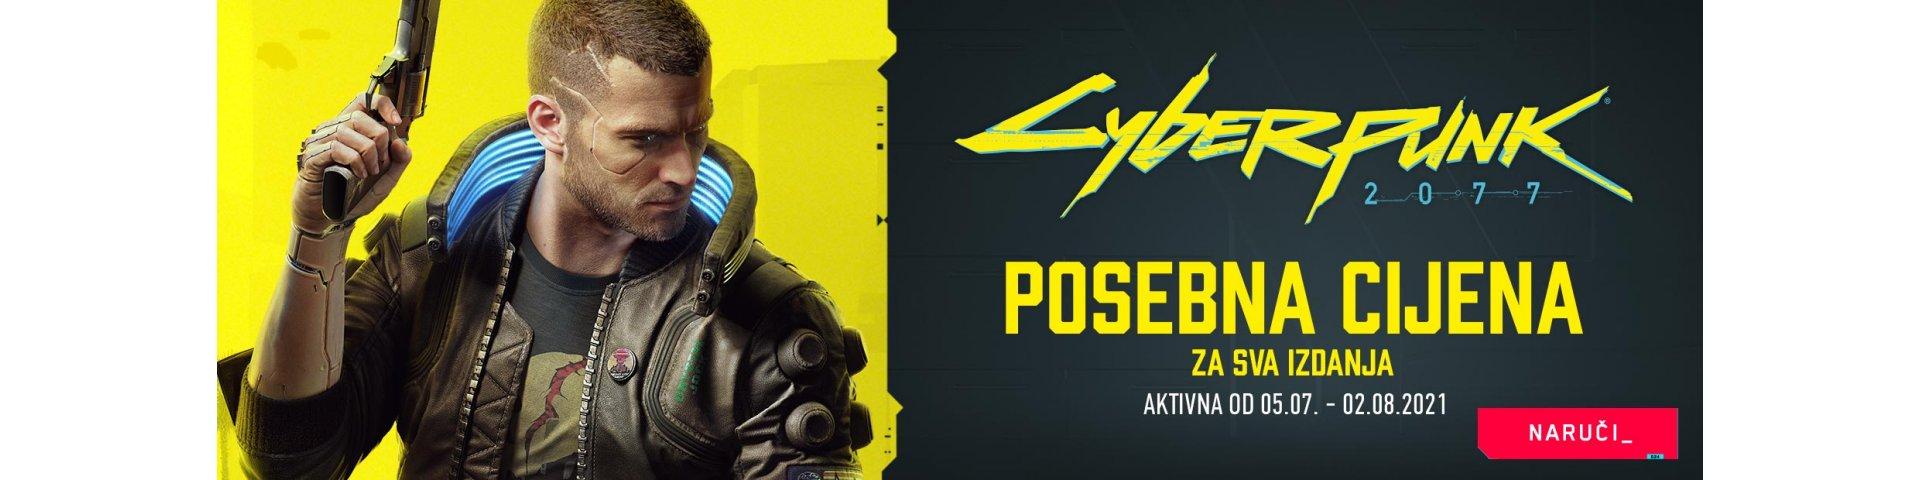 Cyberpunk 2077 SOA 05.07.2021. - 02.08.2021.